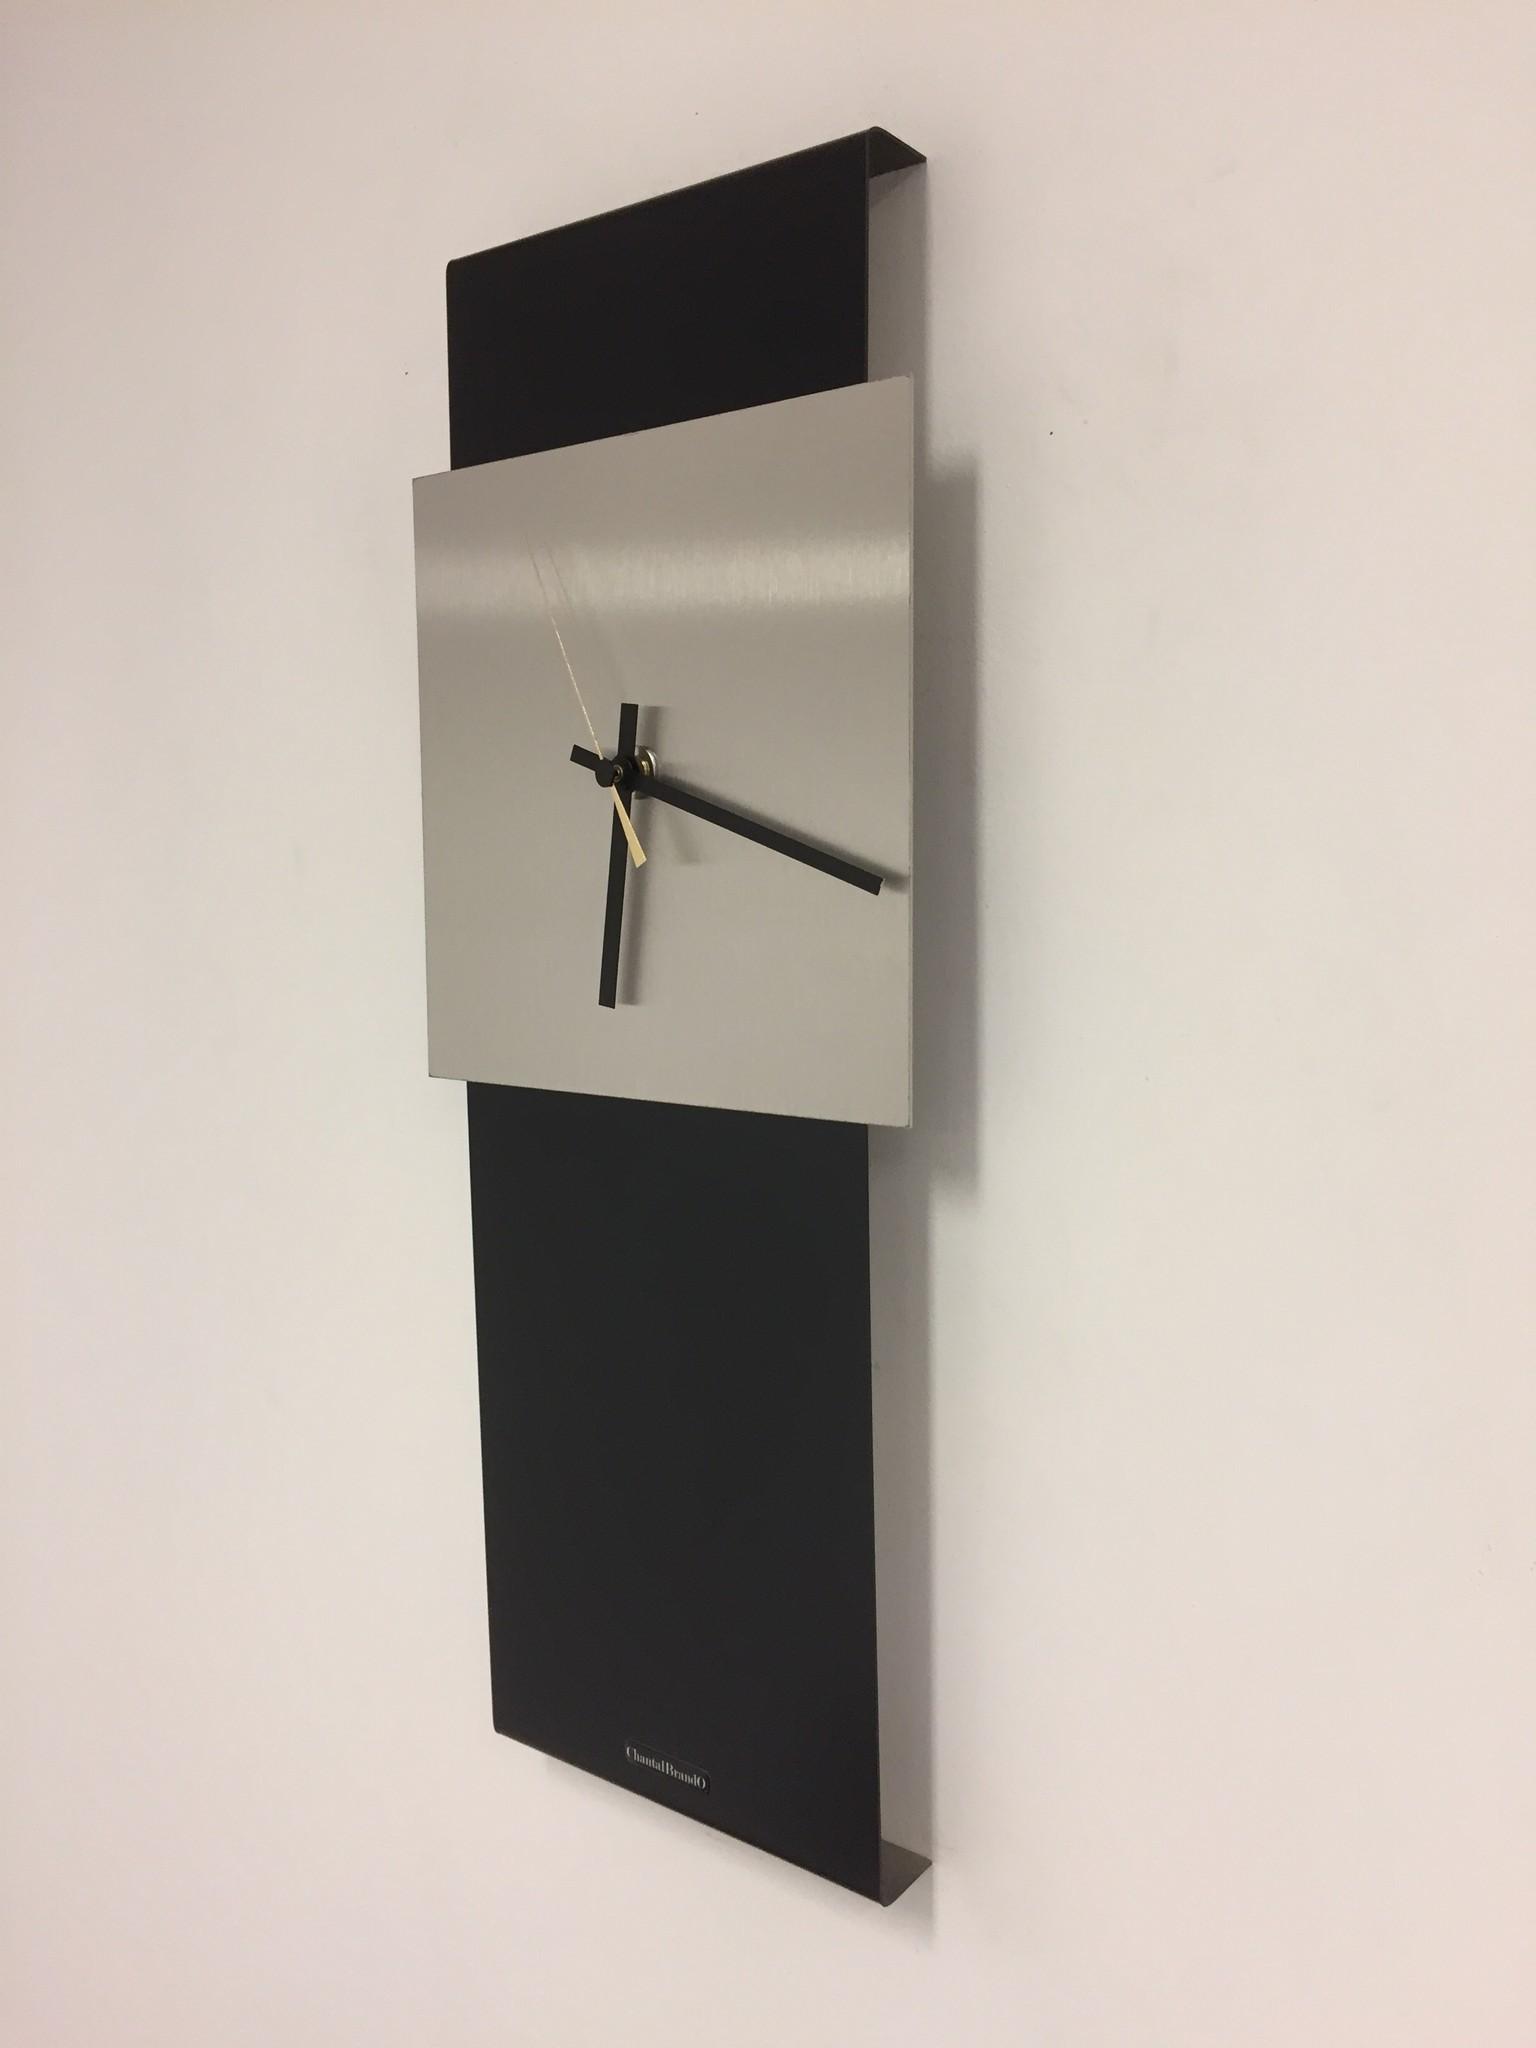 ChantalBrandO Wandklok LaBrand Export Design Black & Gold Pointer modern design